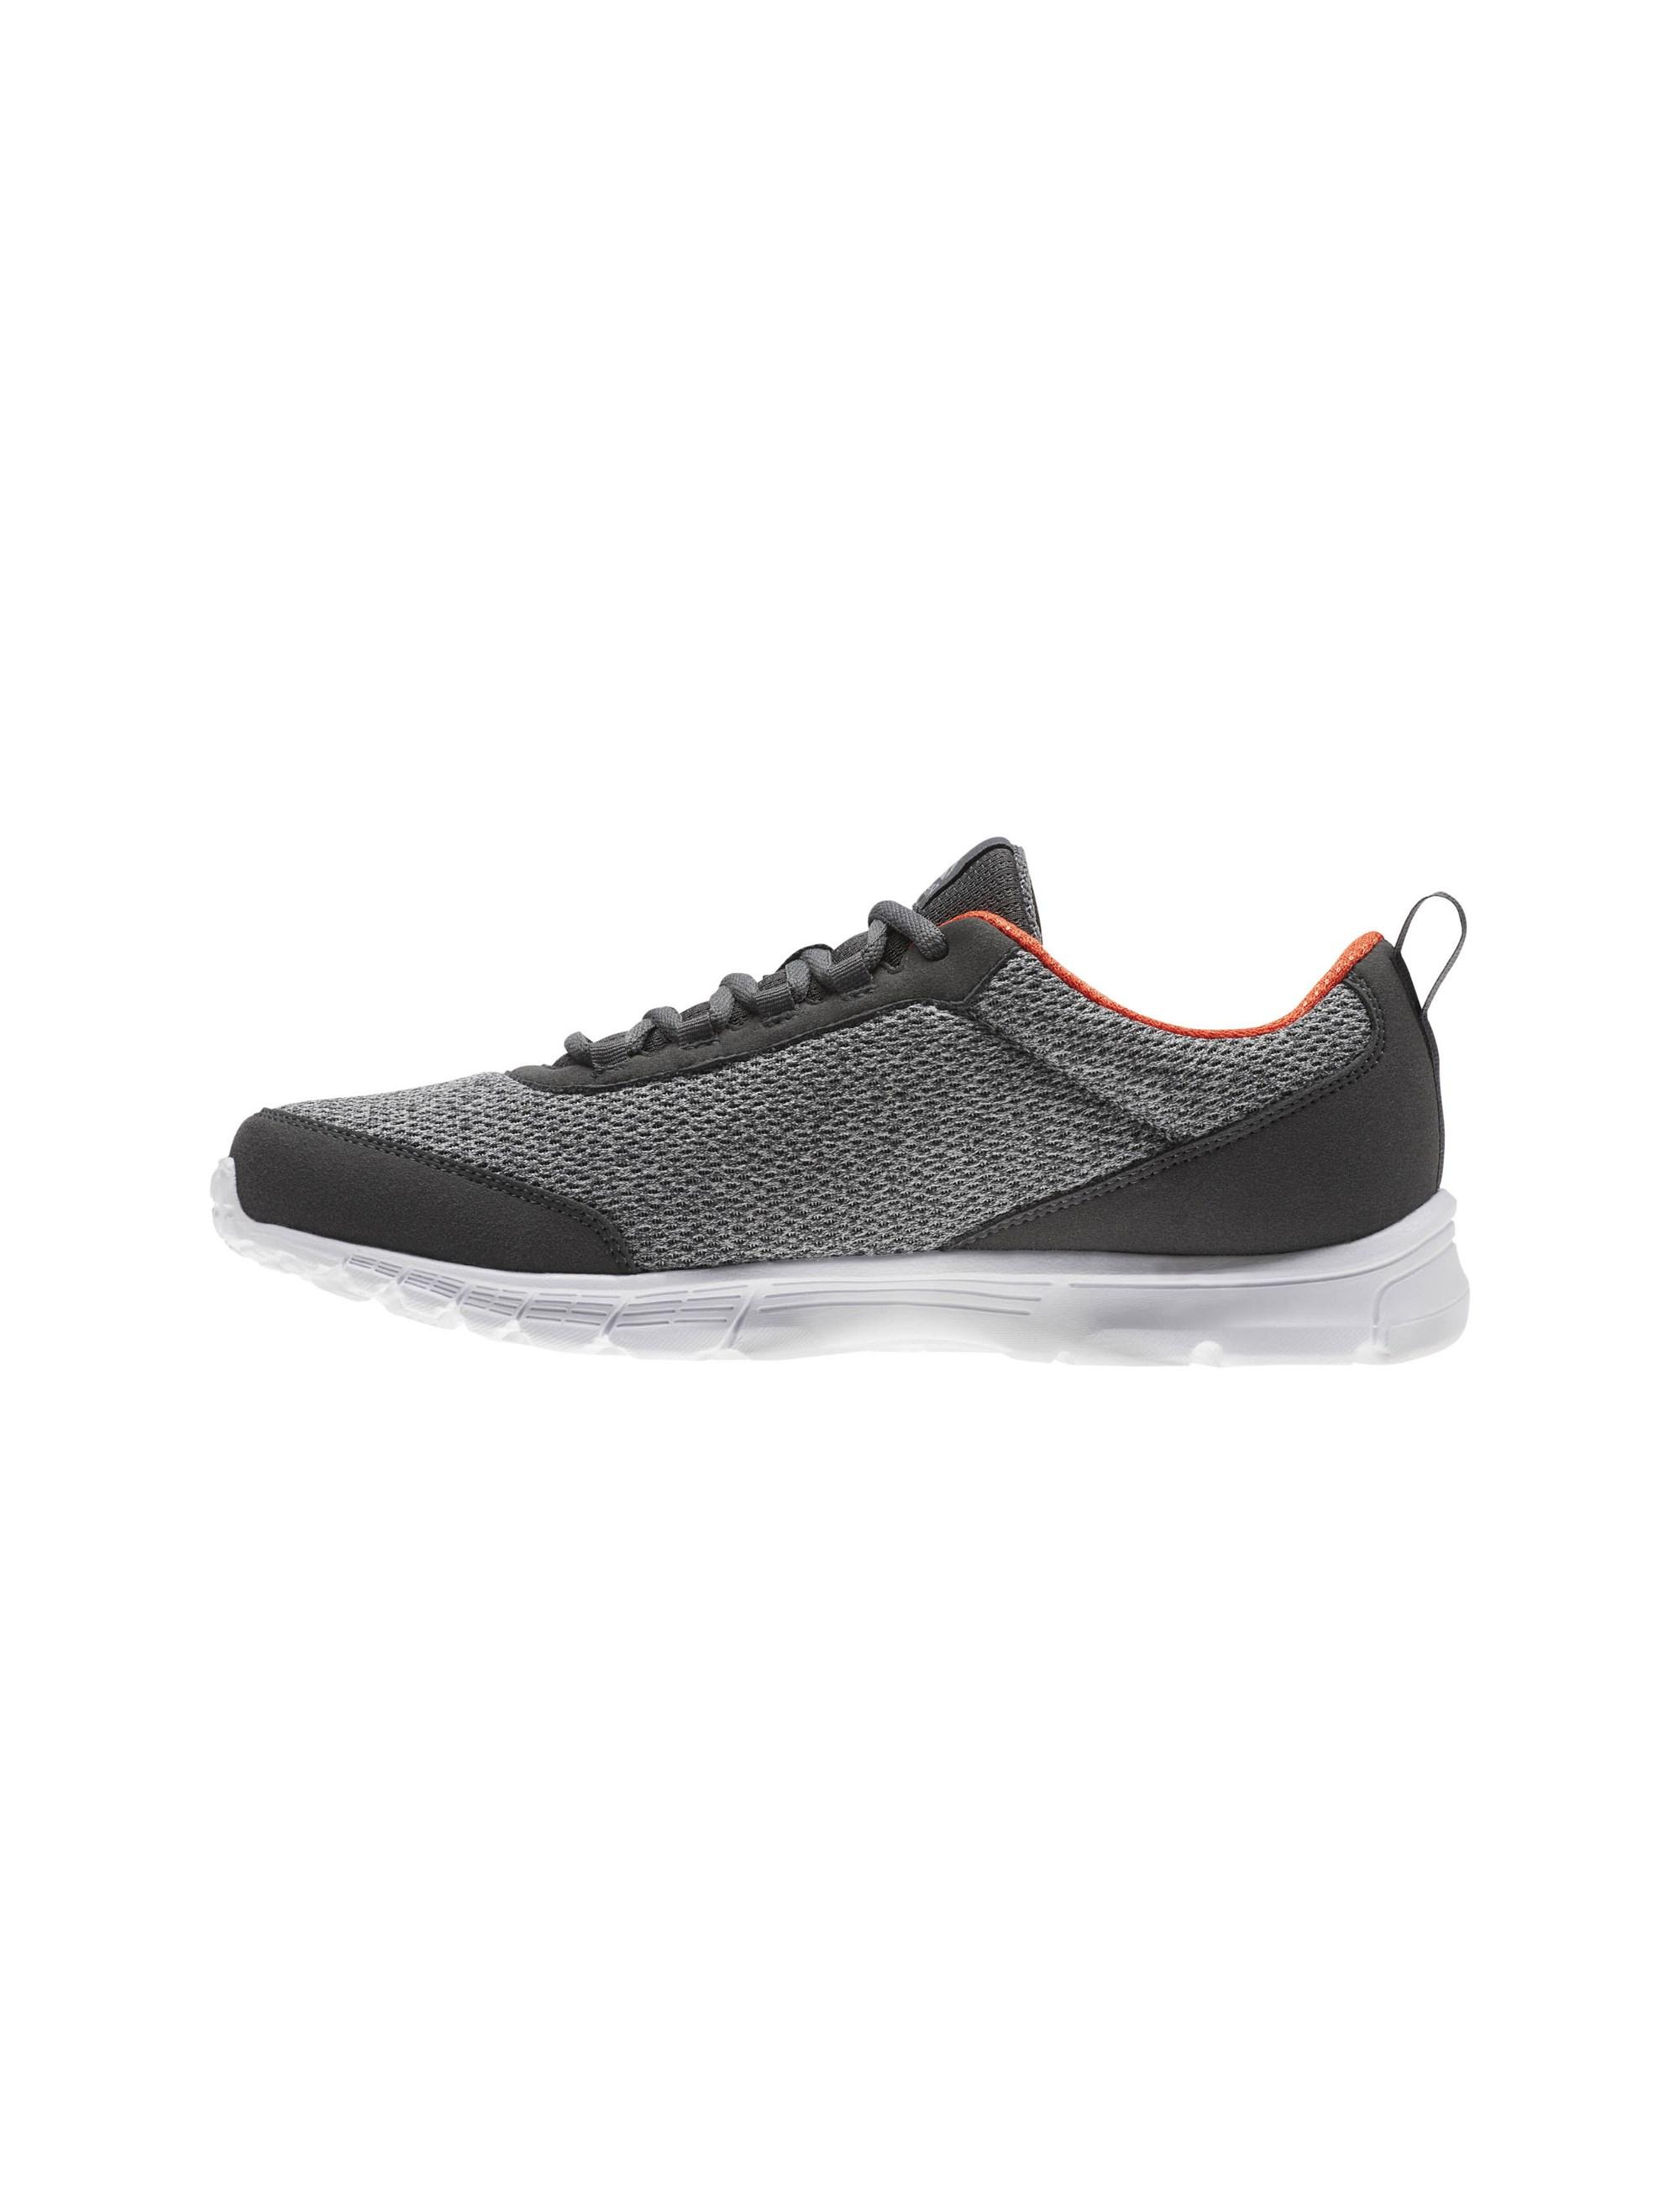 کفش دویدن بندی مردانه Speedlux - طوسي - 3